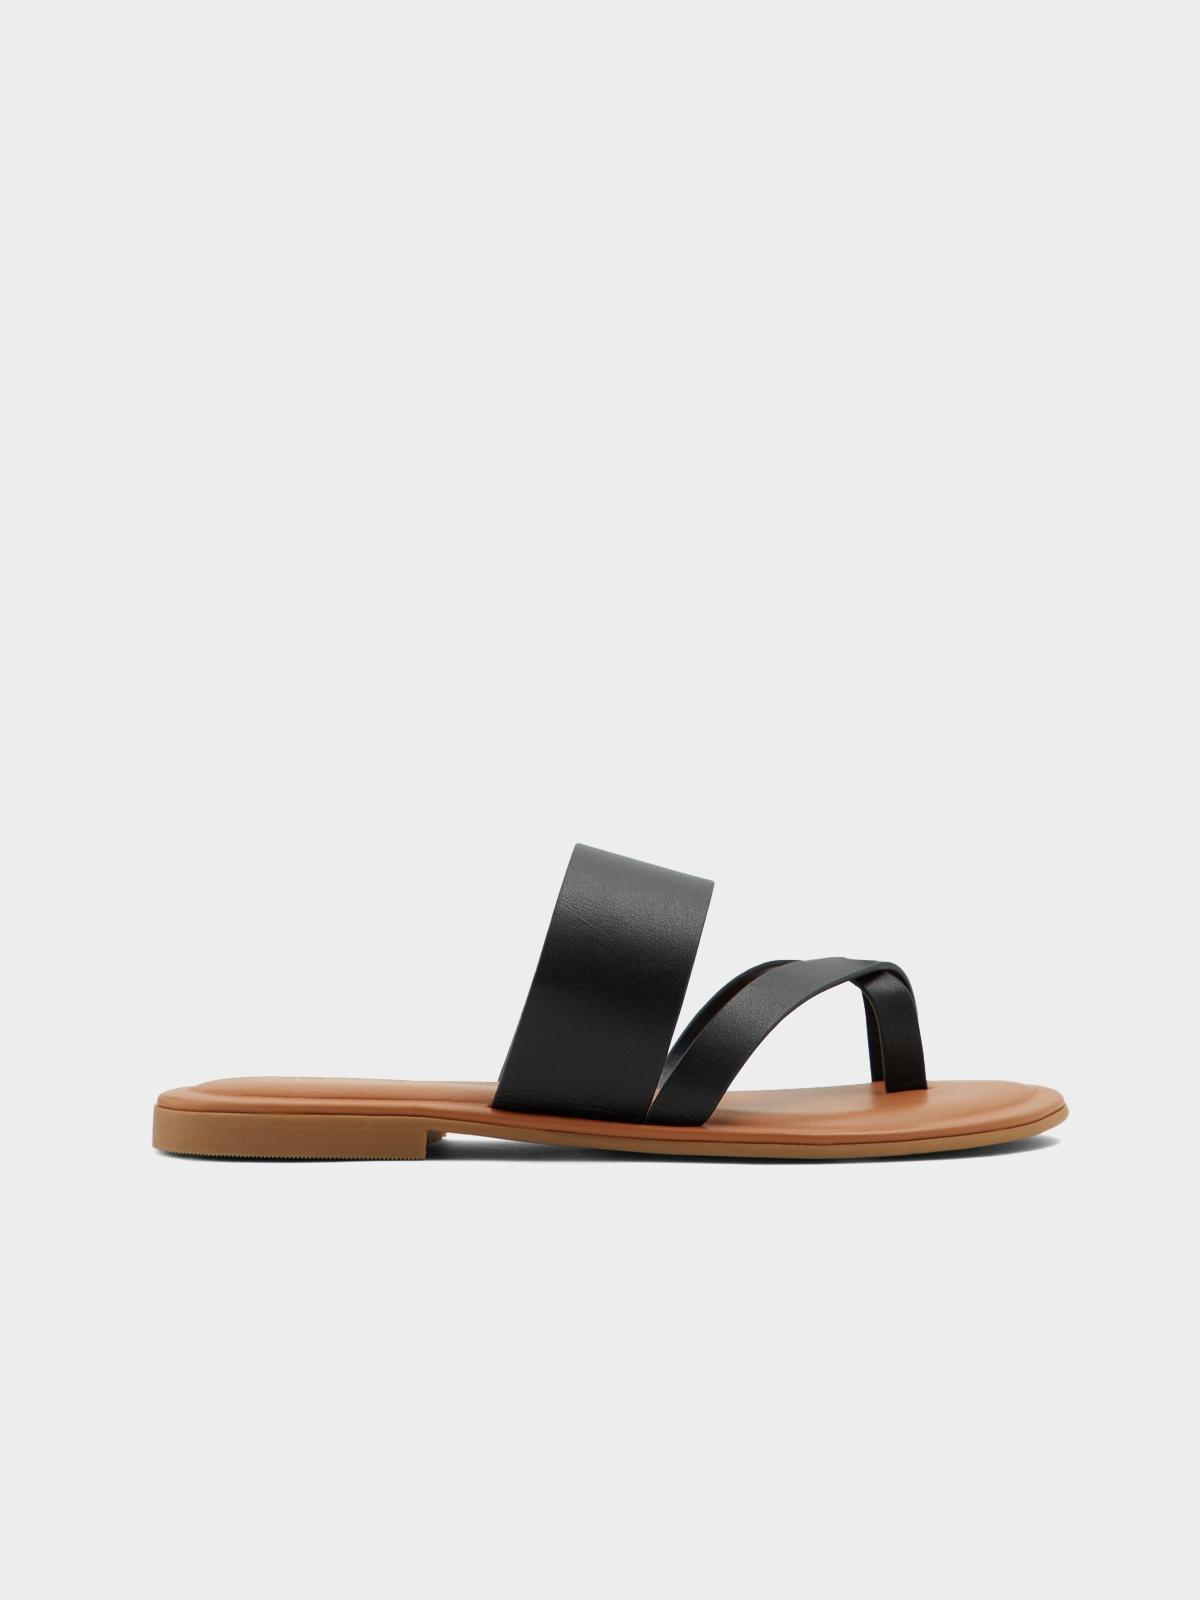 Aldo Carine Block Heels Black